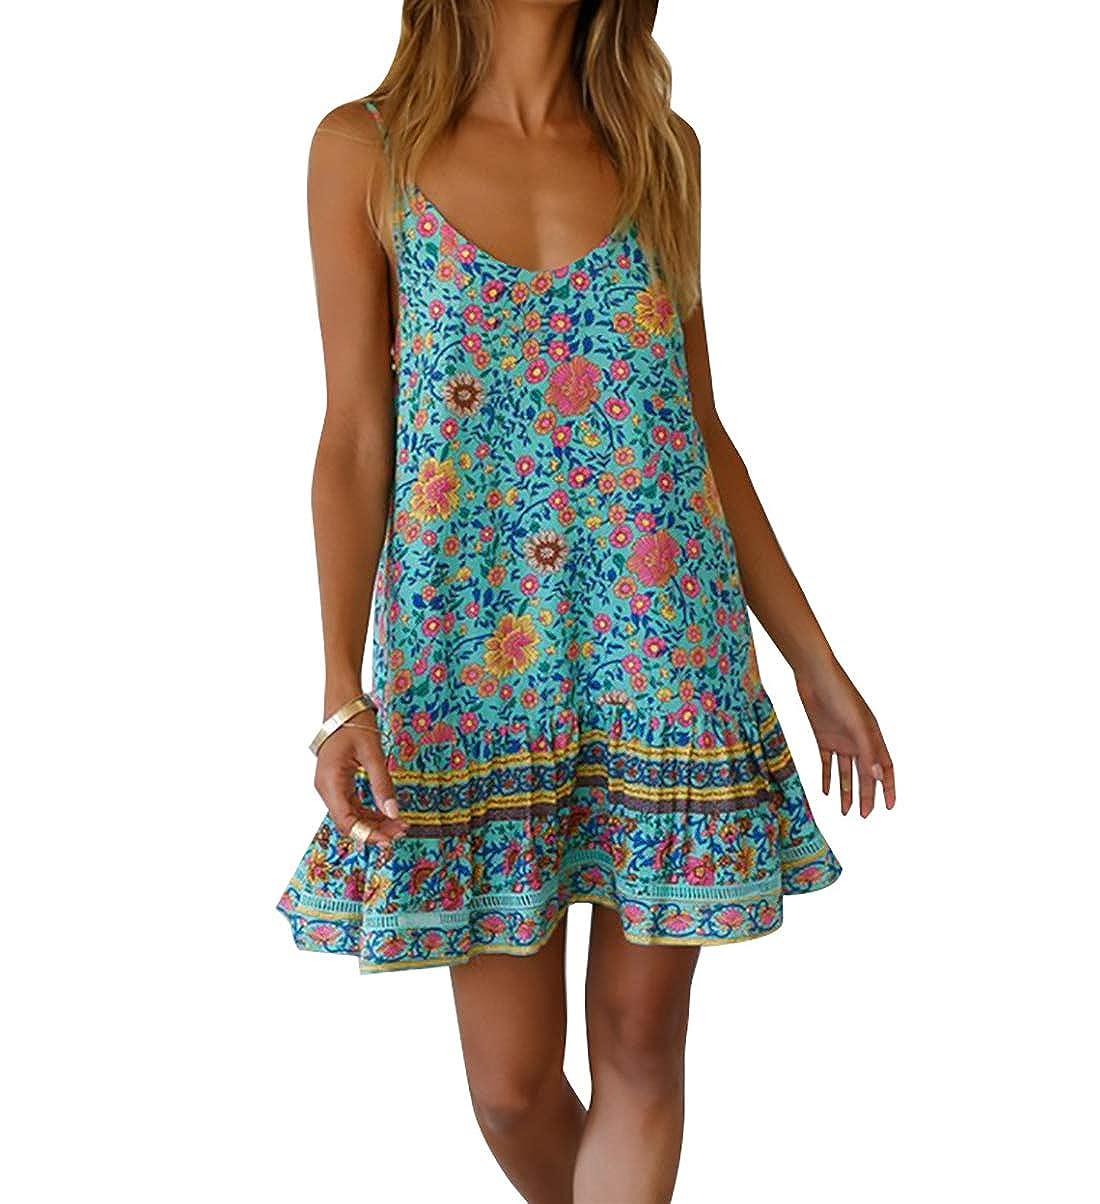 OOFIT Boho Floral Kleid Cocktail Kleid Damen Rückenfrei Minikleid Sommerkleid Strandkleid Partykleid EU34-EU40